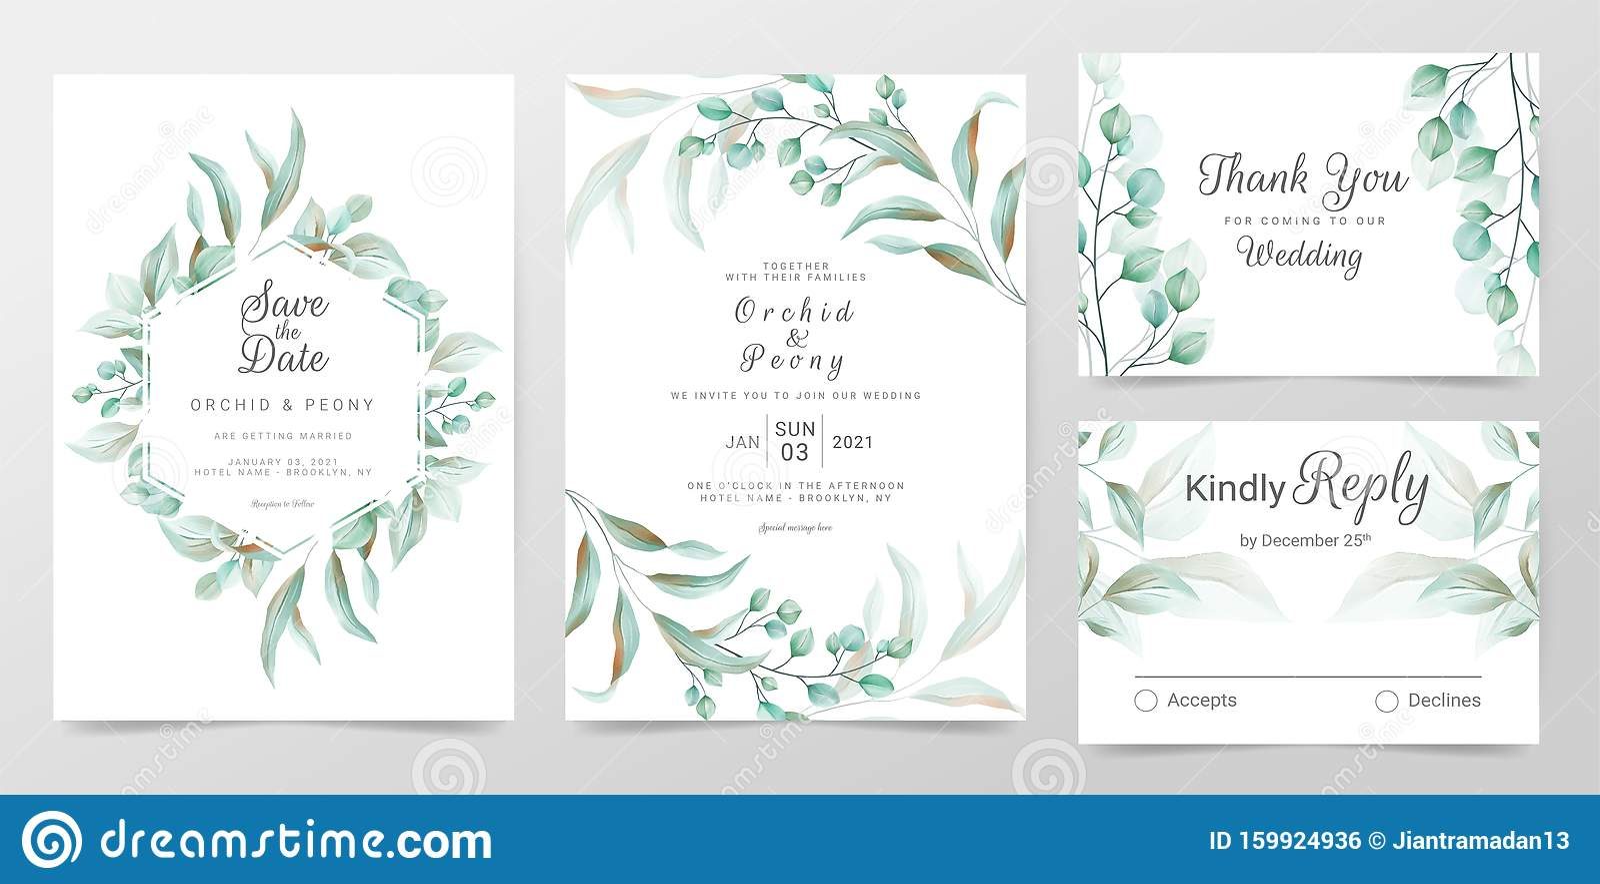 Greenery Save the Date Card Wedding Invitation